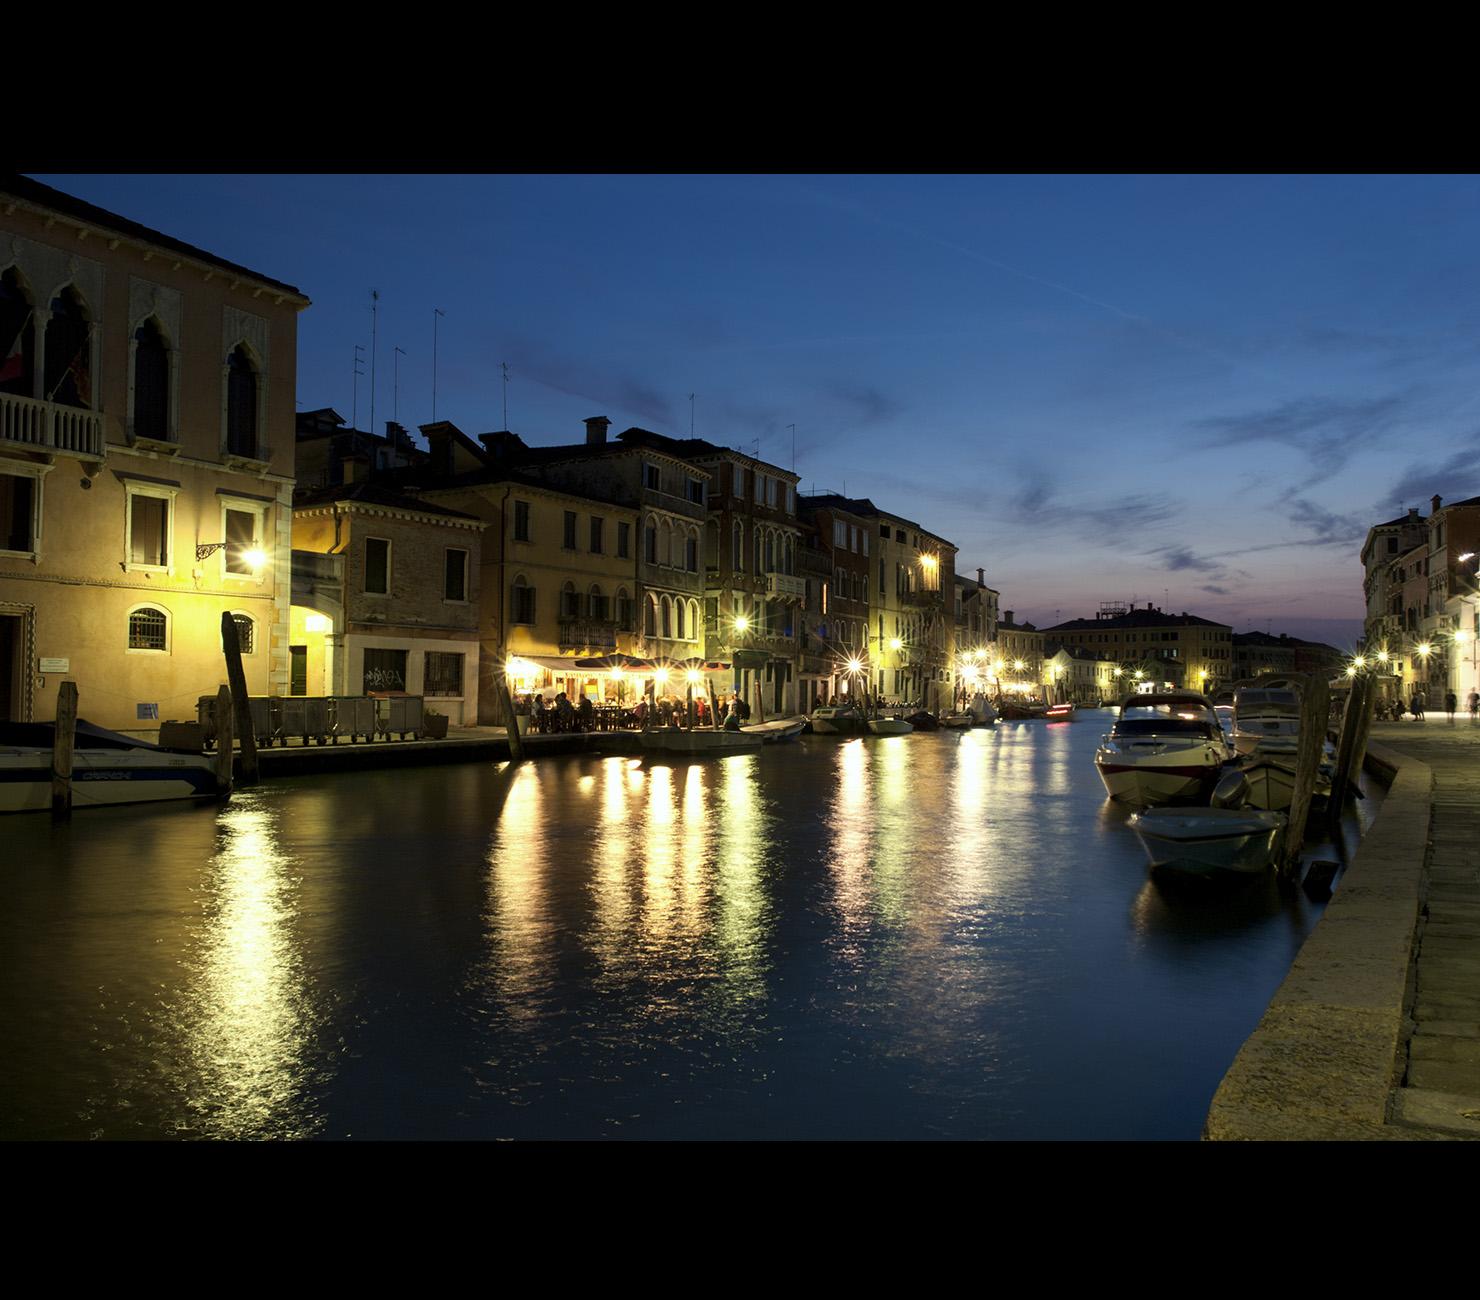 2. Canal de Venecia. Una vista de cine. Ghetu Daniel